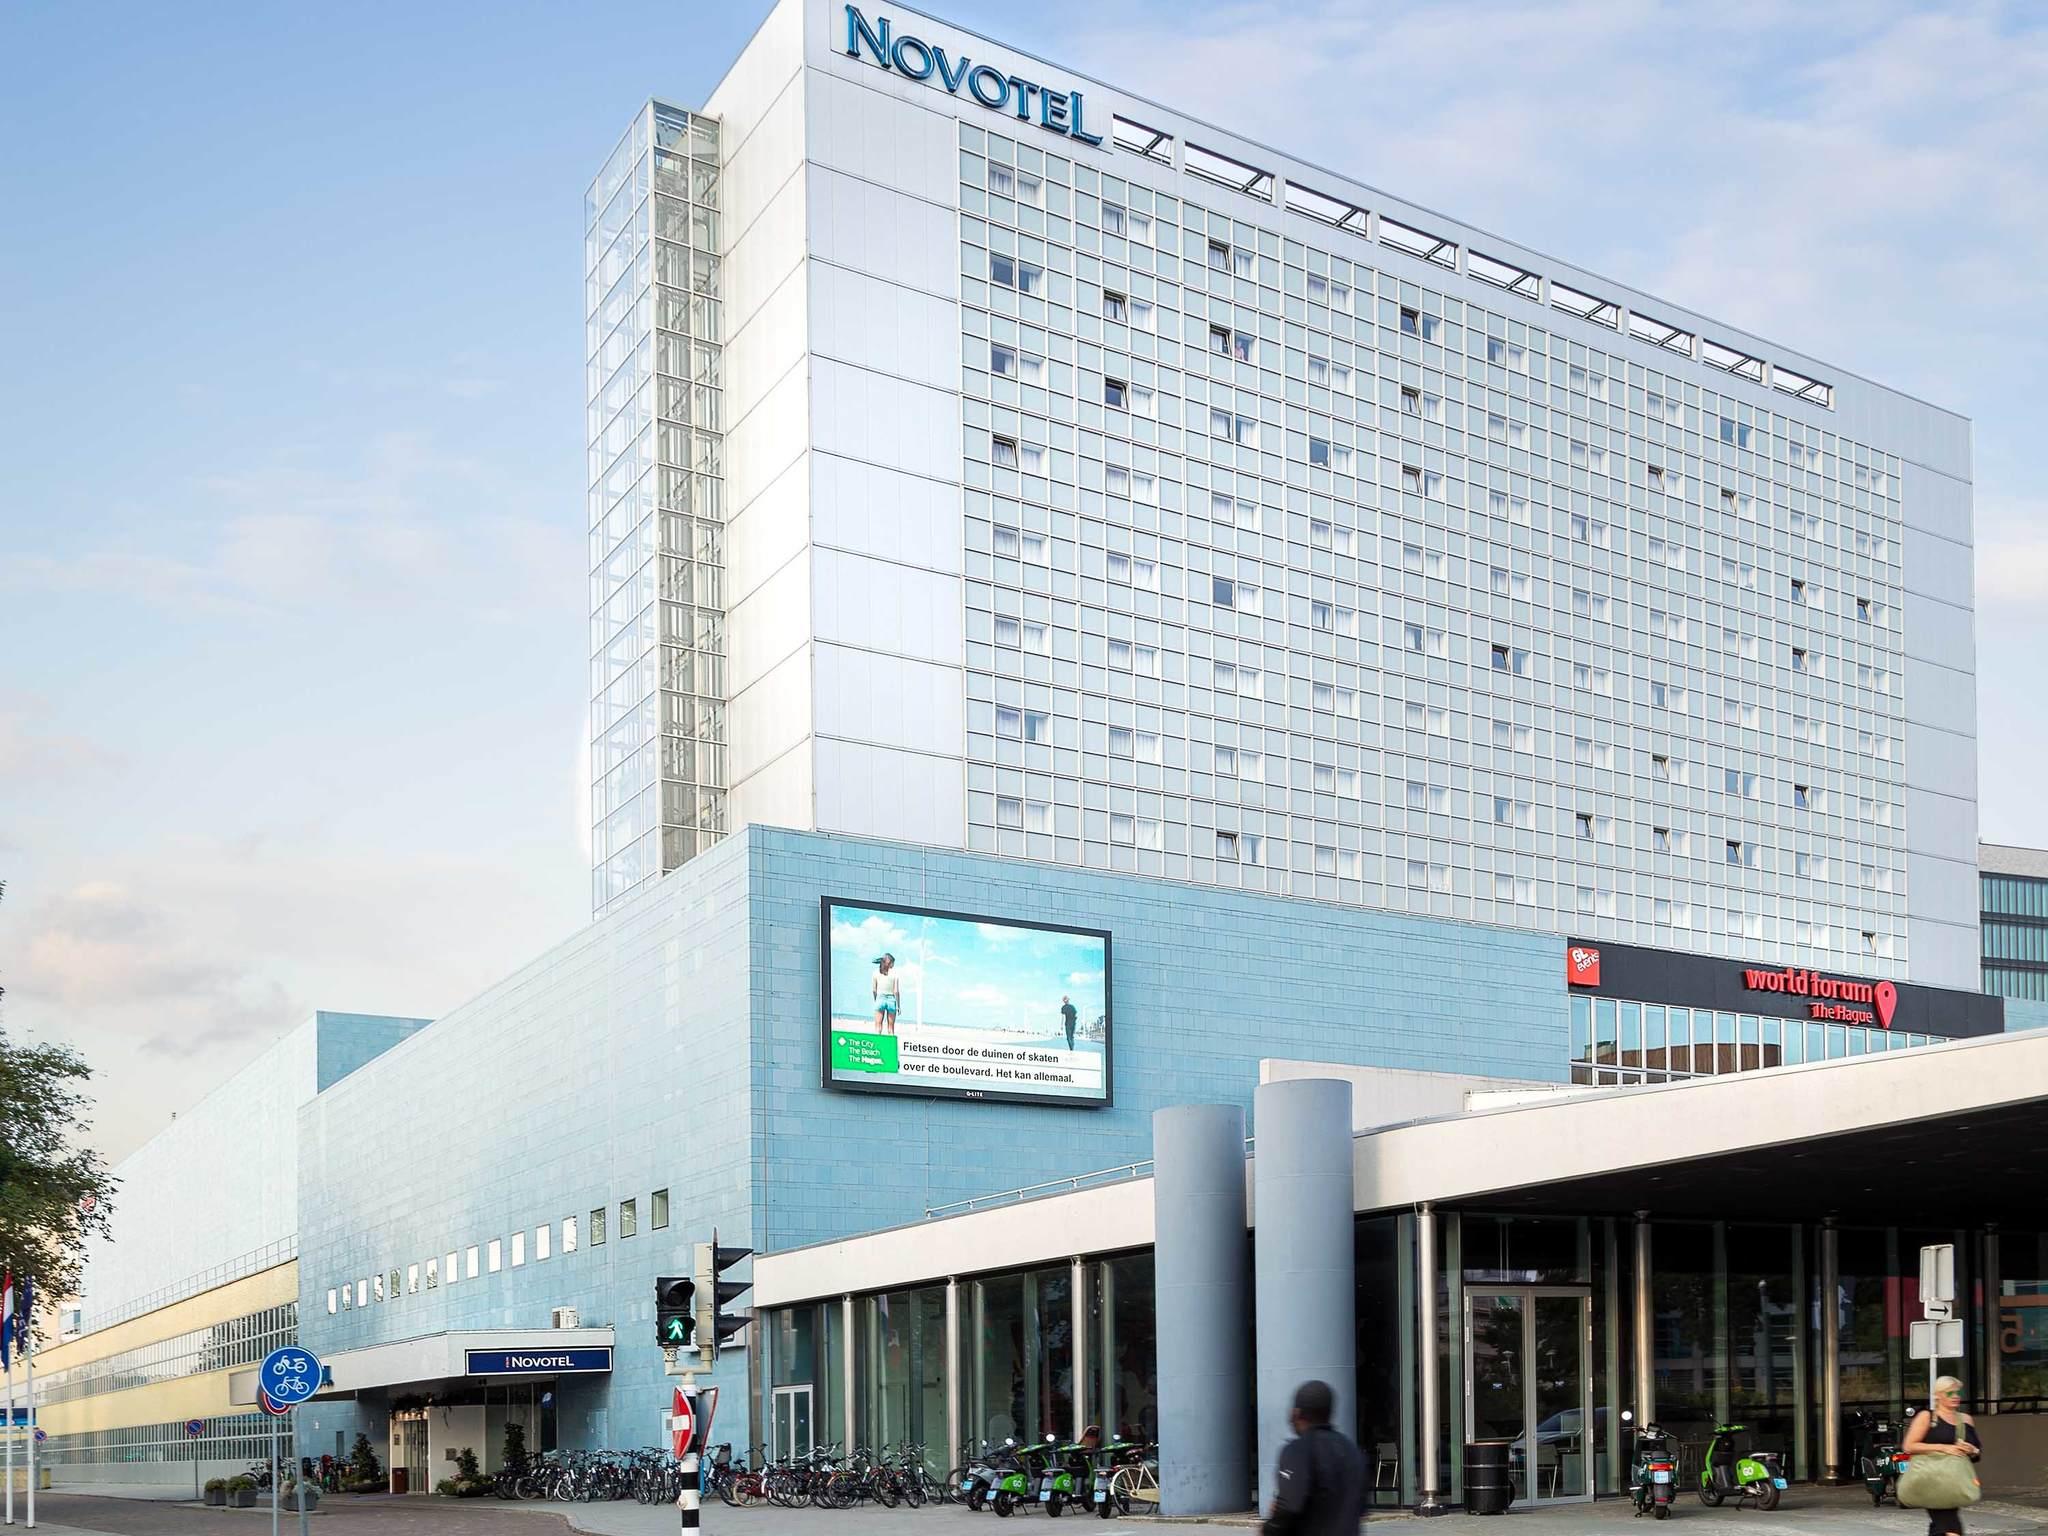 Hôtel - Novotel Den Haag World Forum